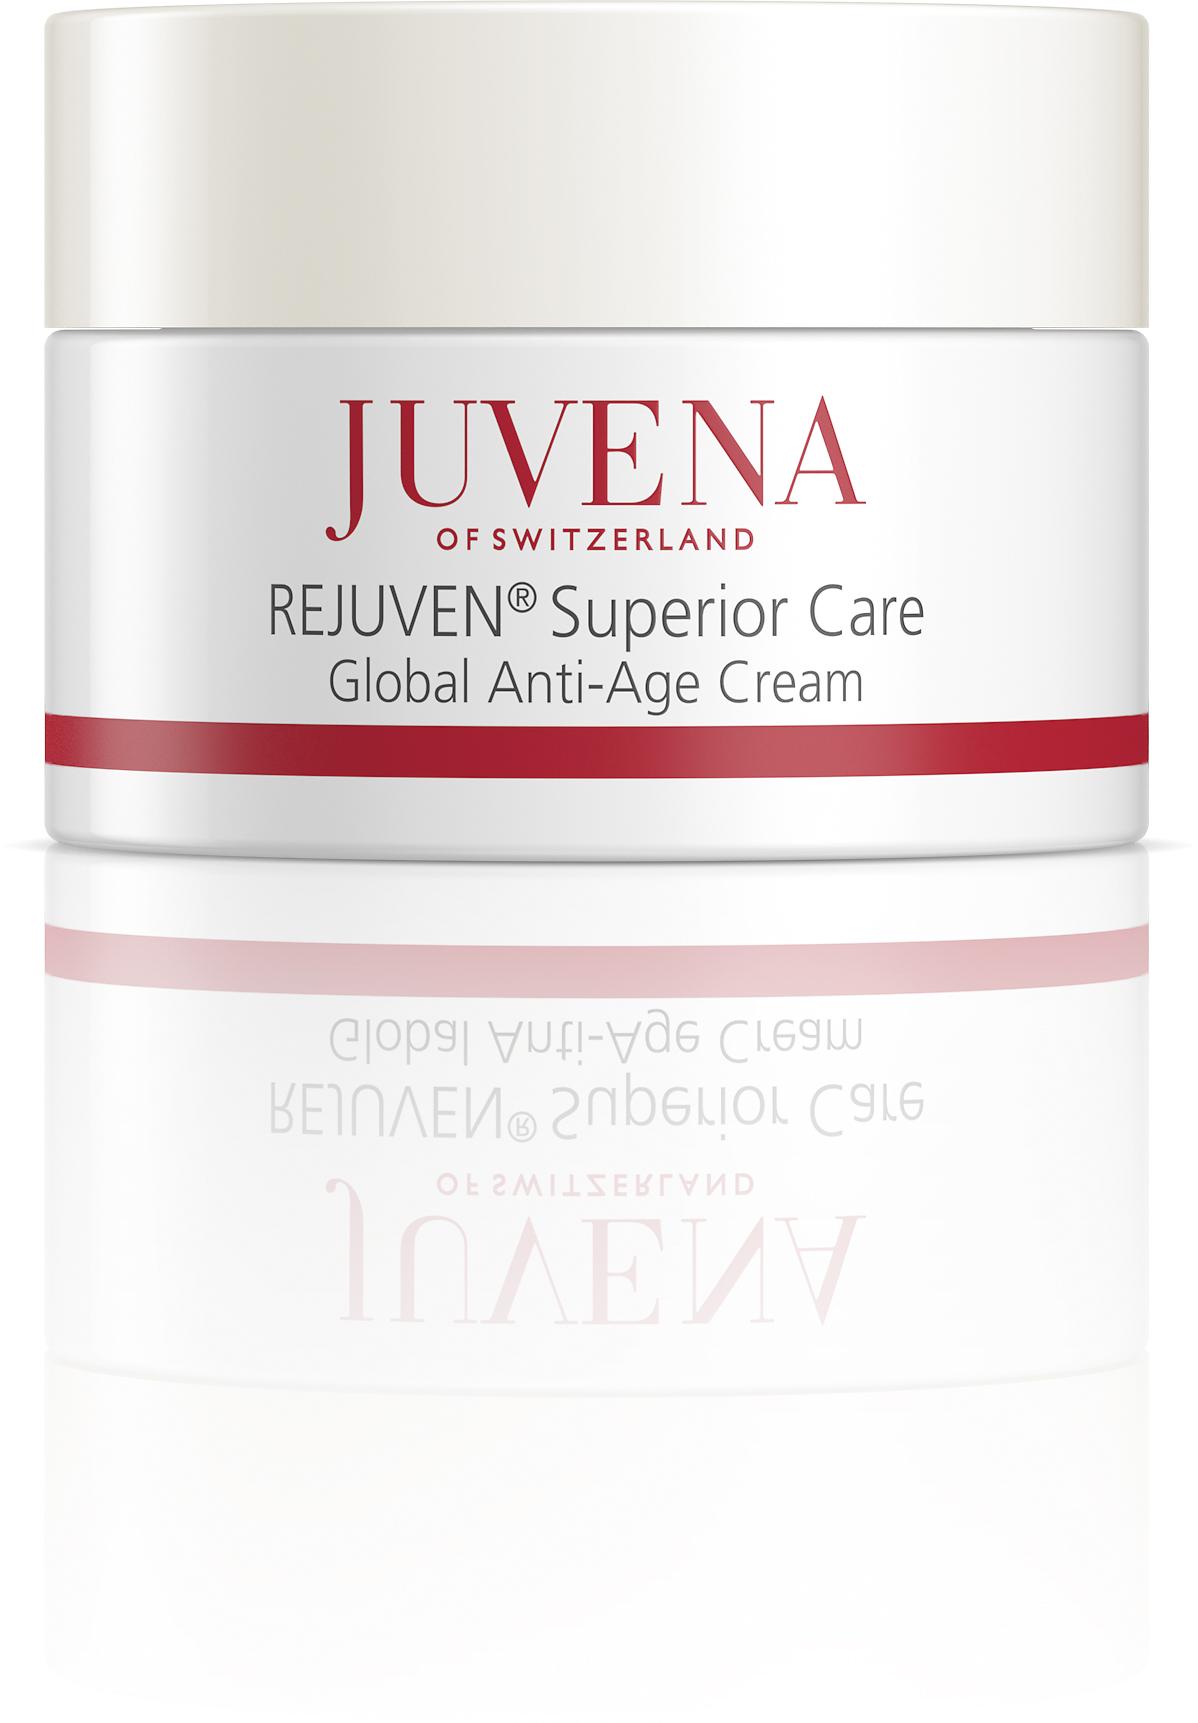 Juvena Rejuven Men Global Anti Age Cream 50 ml